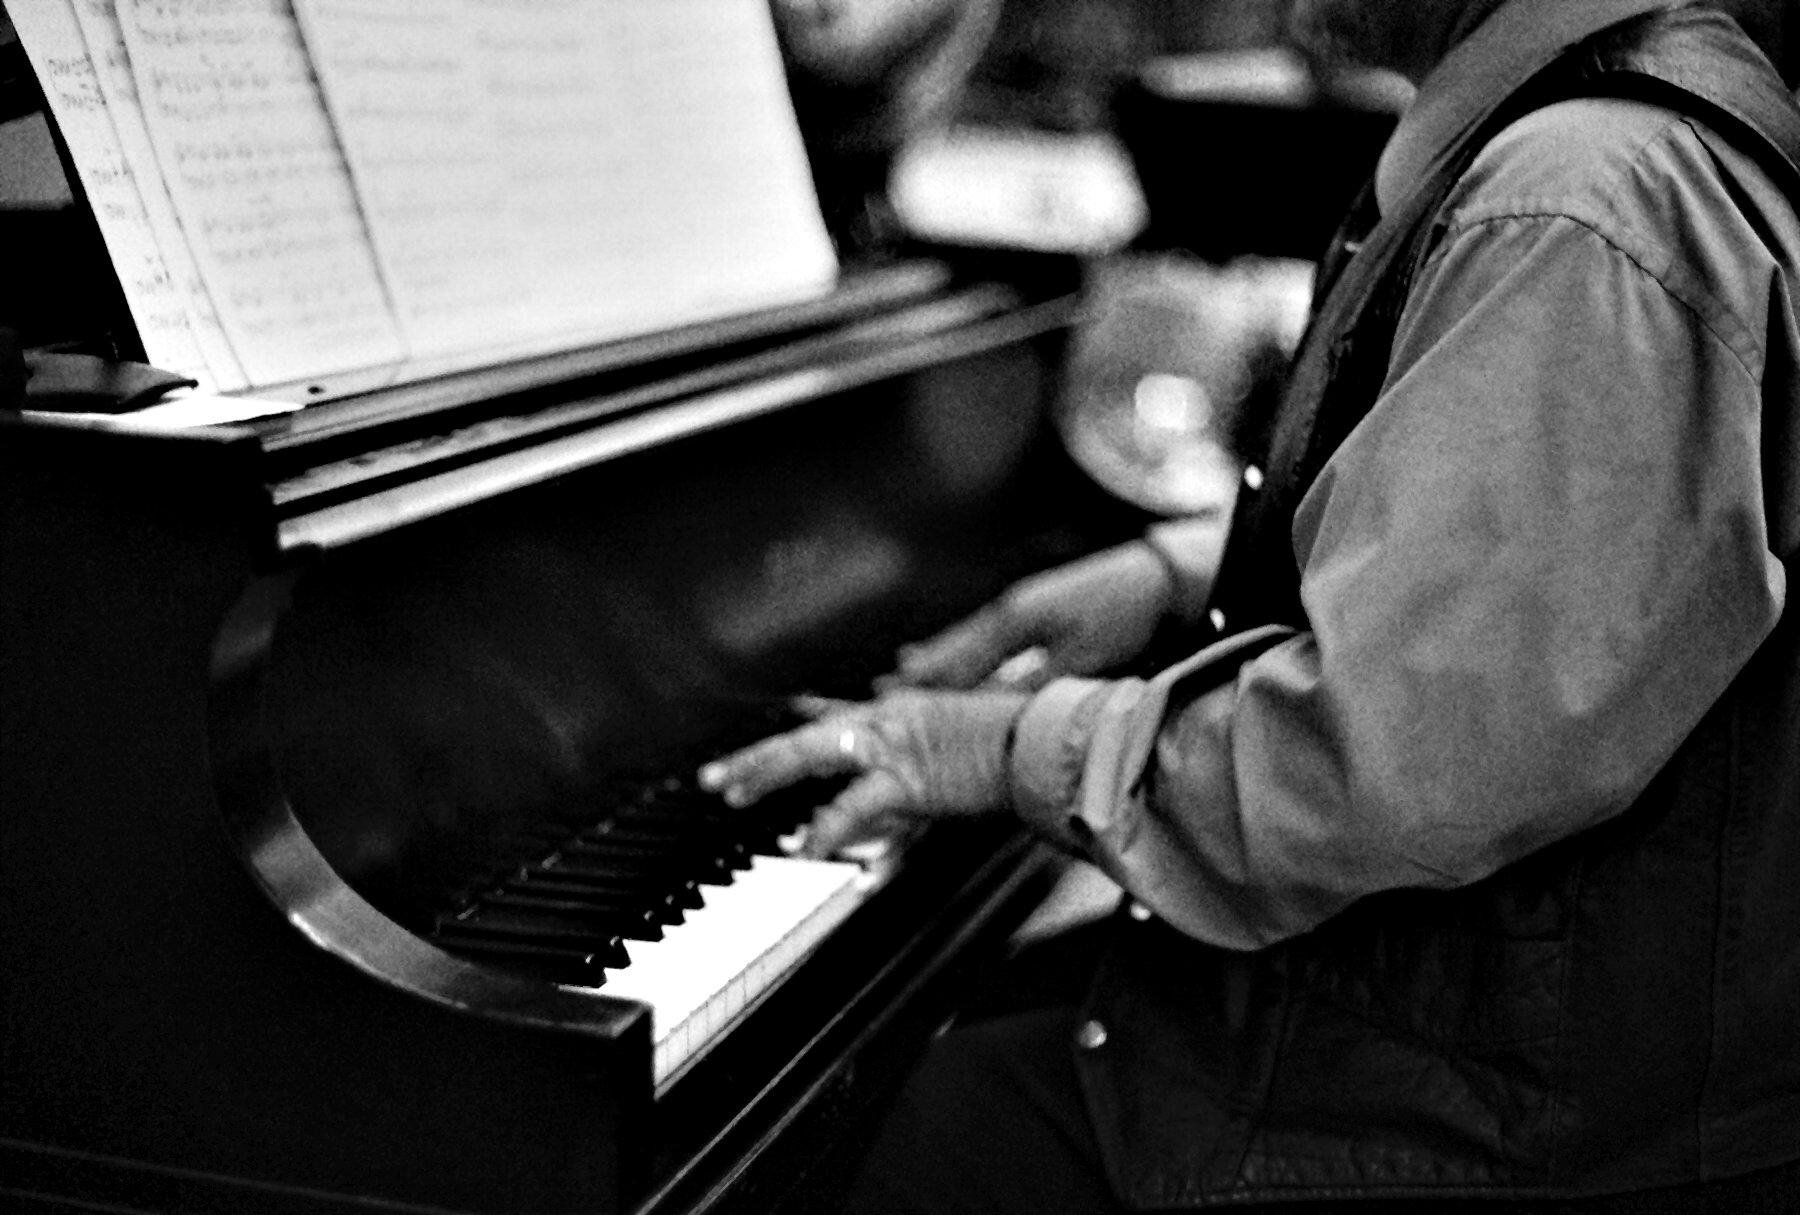 Improvvisare : tecnica jazz di improvvisazione